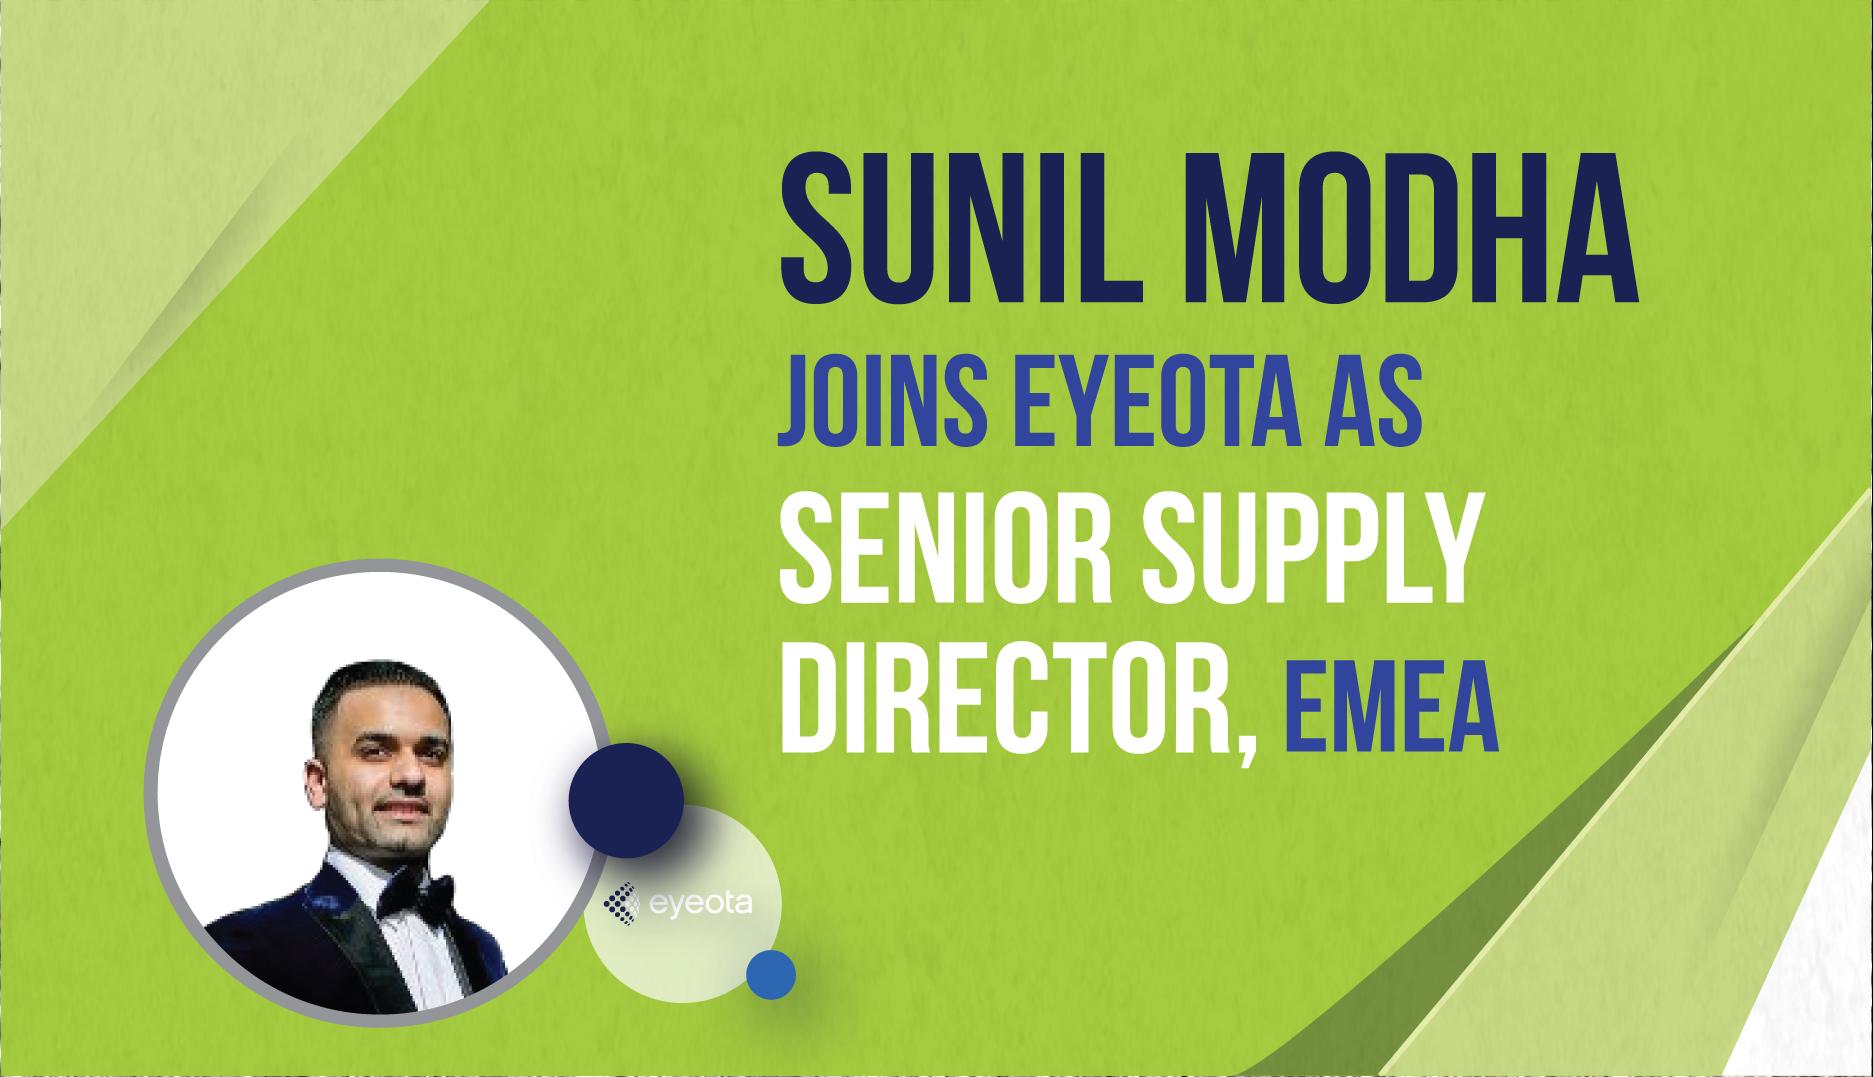 Sunil Modha Joins Eyeota as Senior Supply Director, EMEA